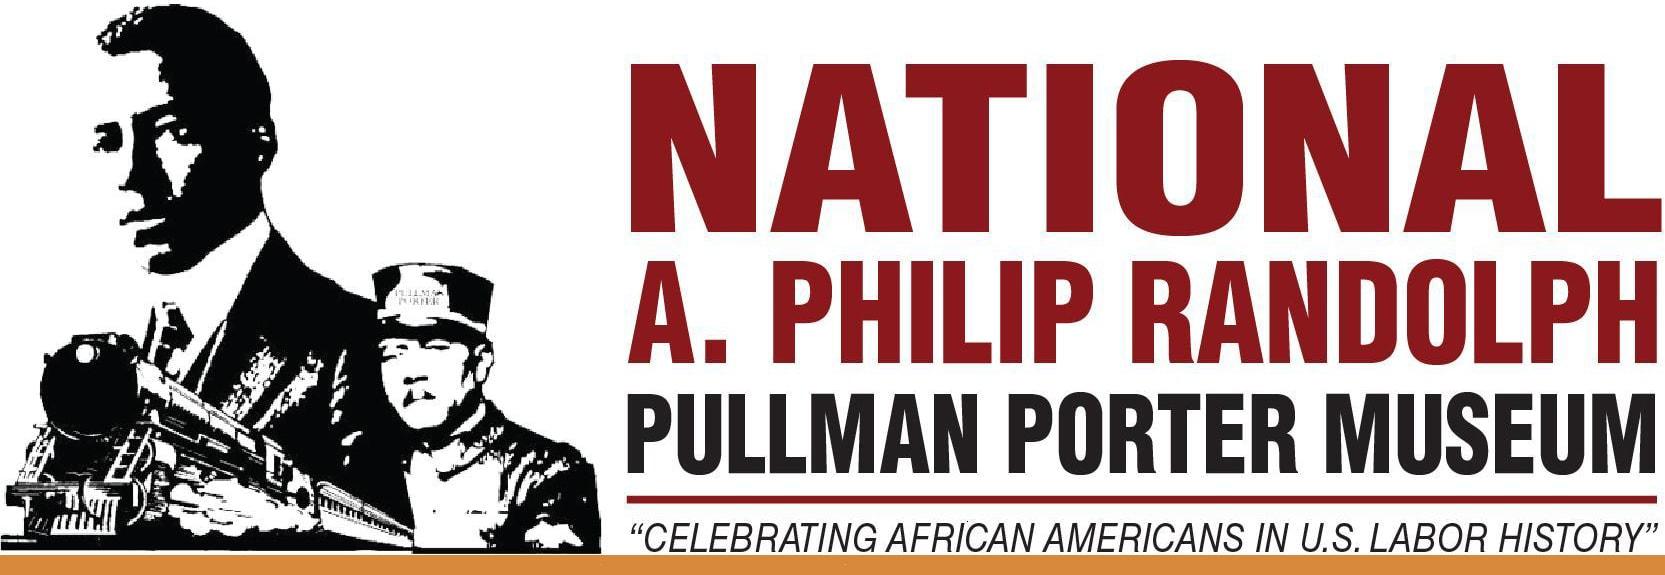 The A. Philip Randolph Pullman Porter Museum